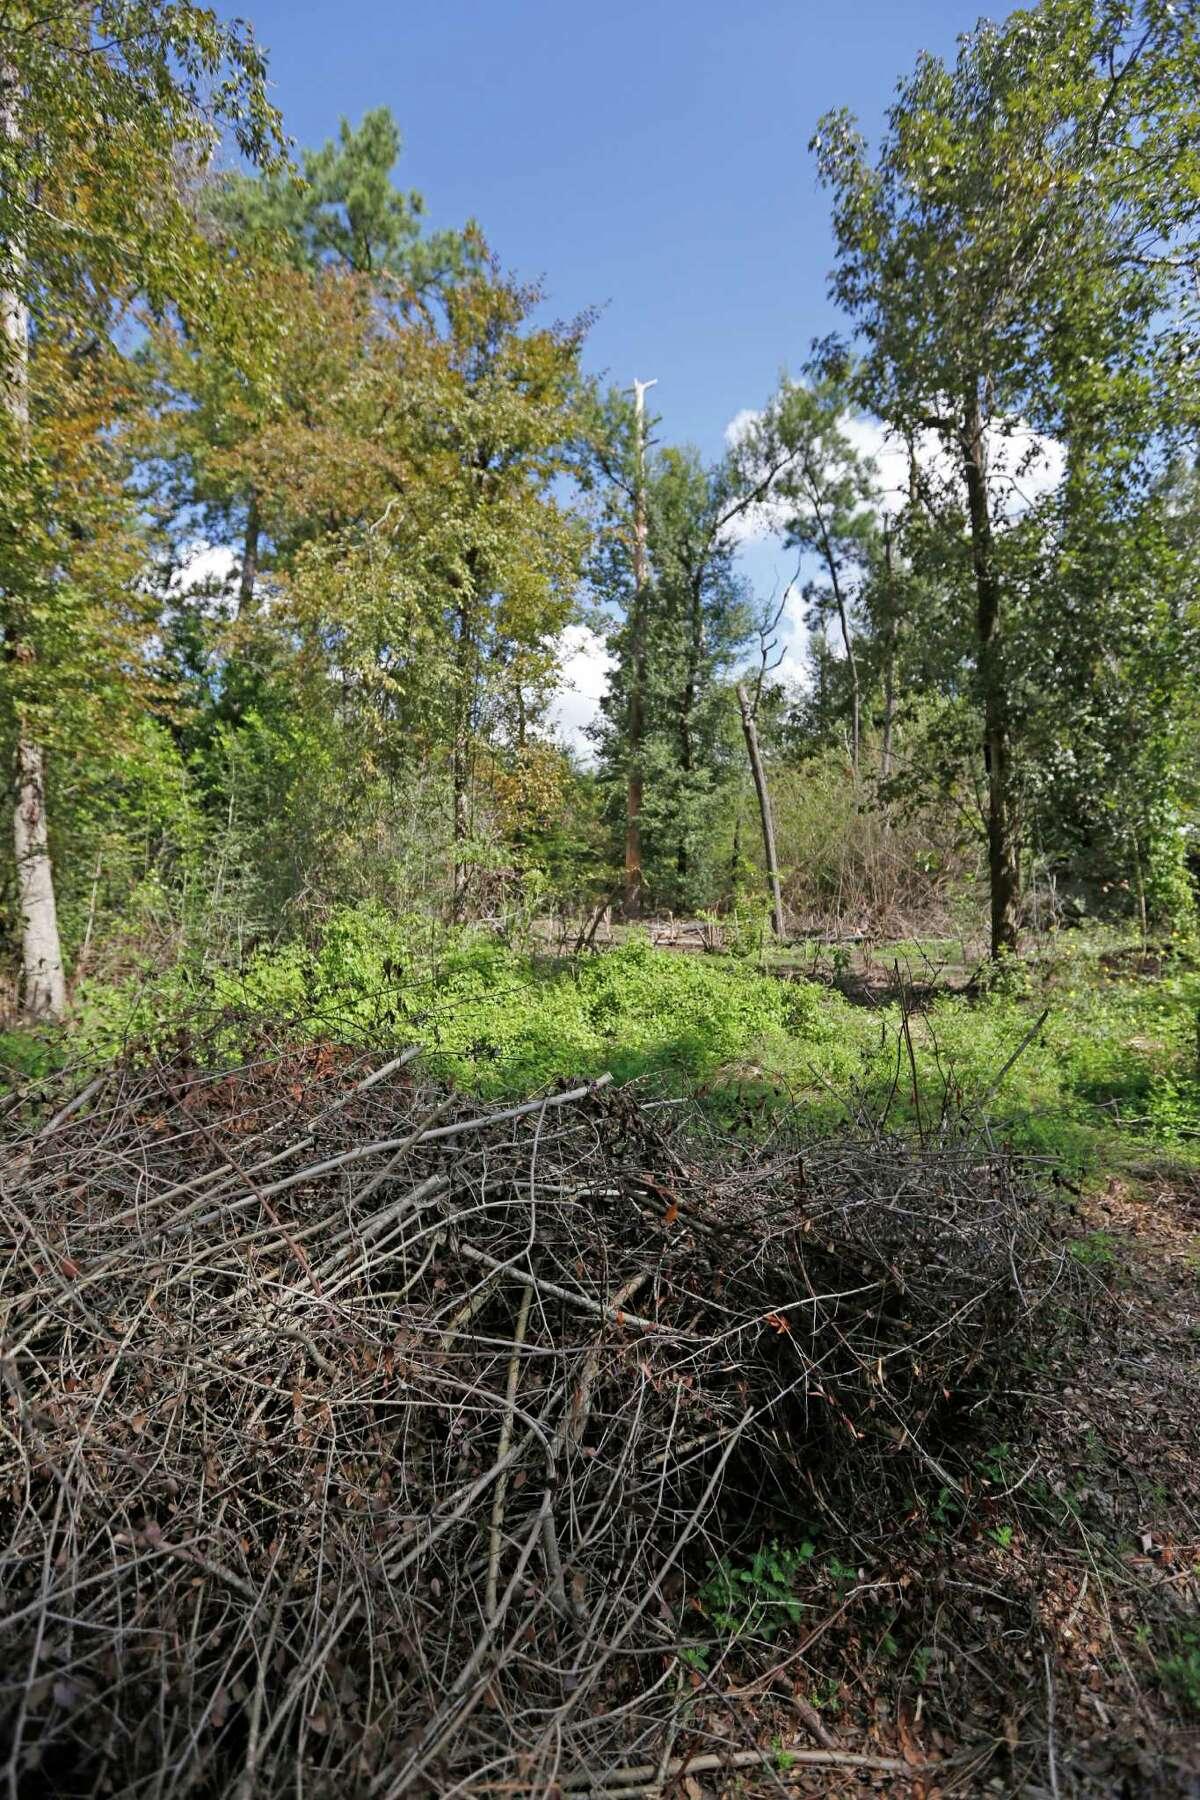 Stacks of cut brush and invasive plants at The Houston Arboretum & Nature Center trails.